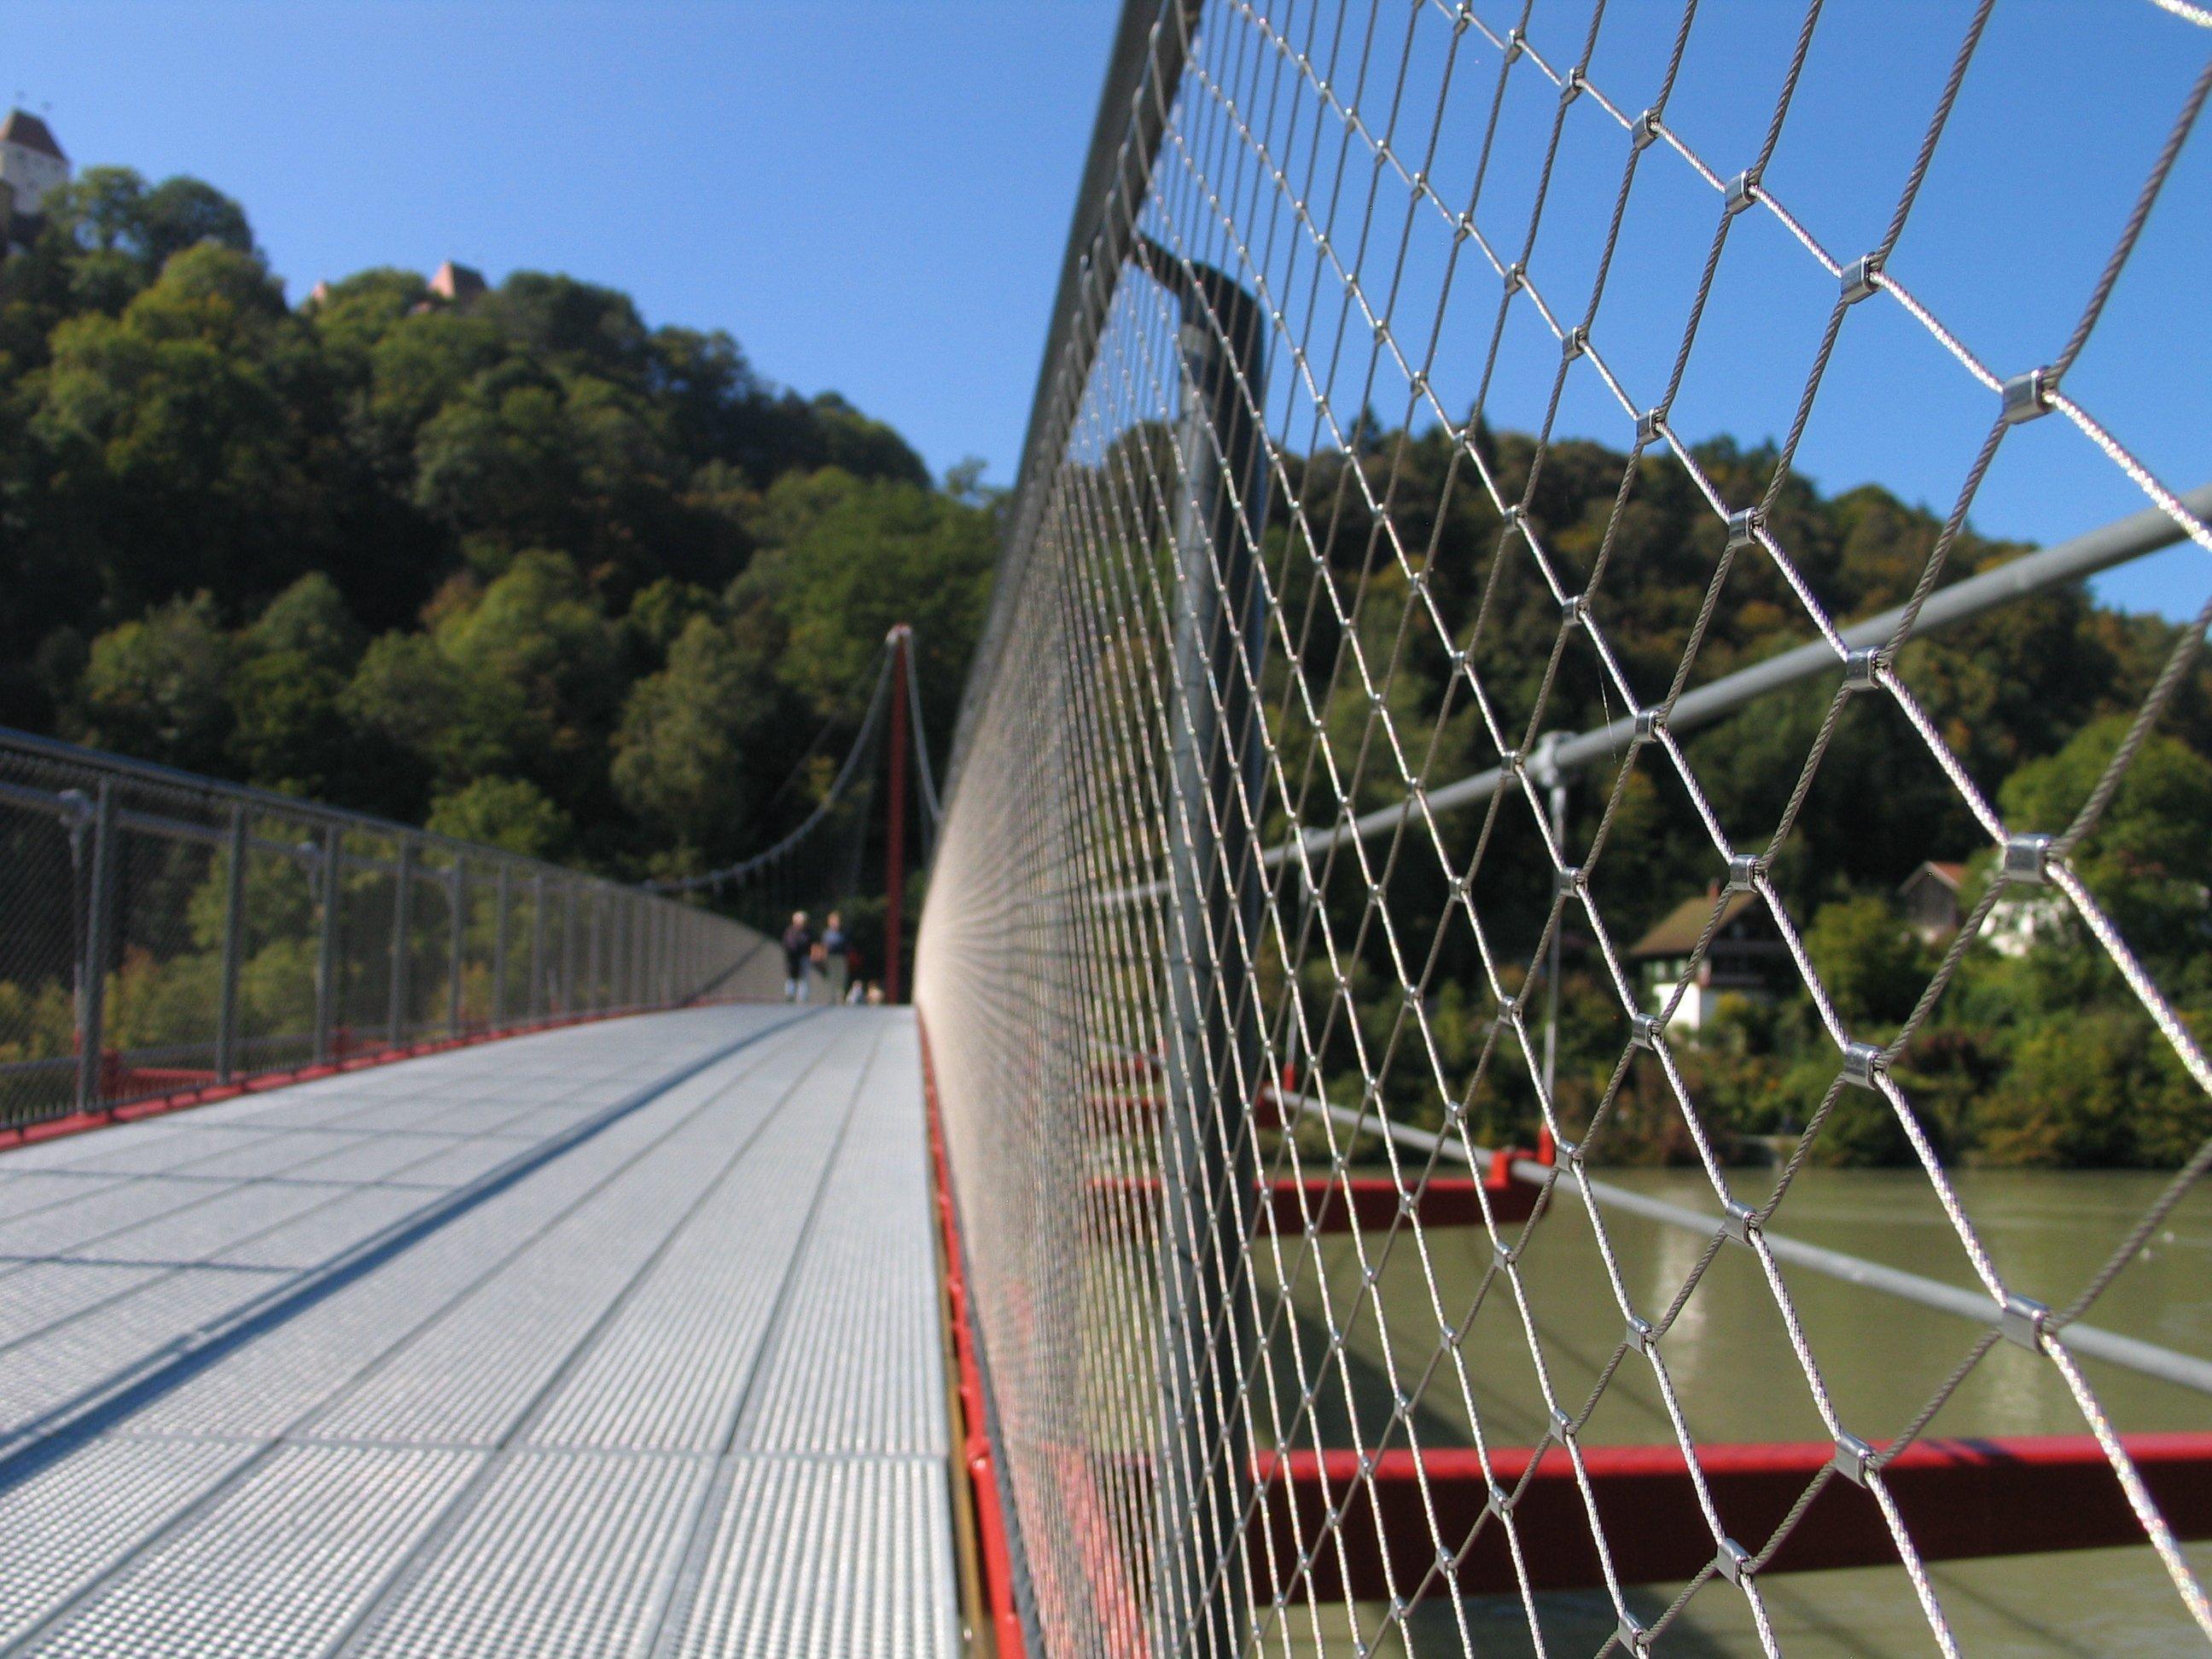 X-TEND balustrade infill mesh stainless steel mesh bridge